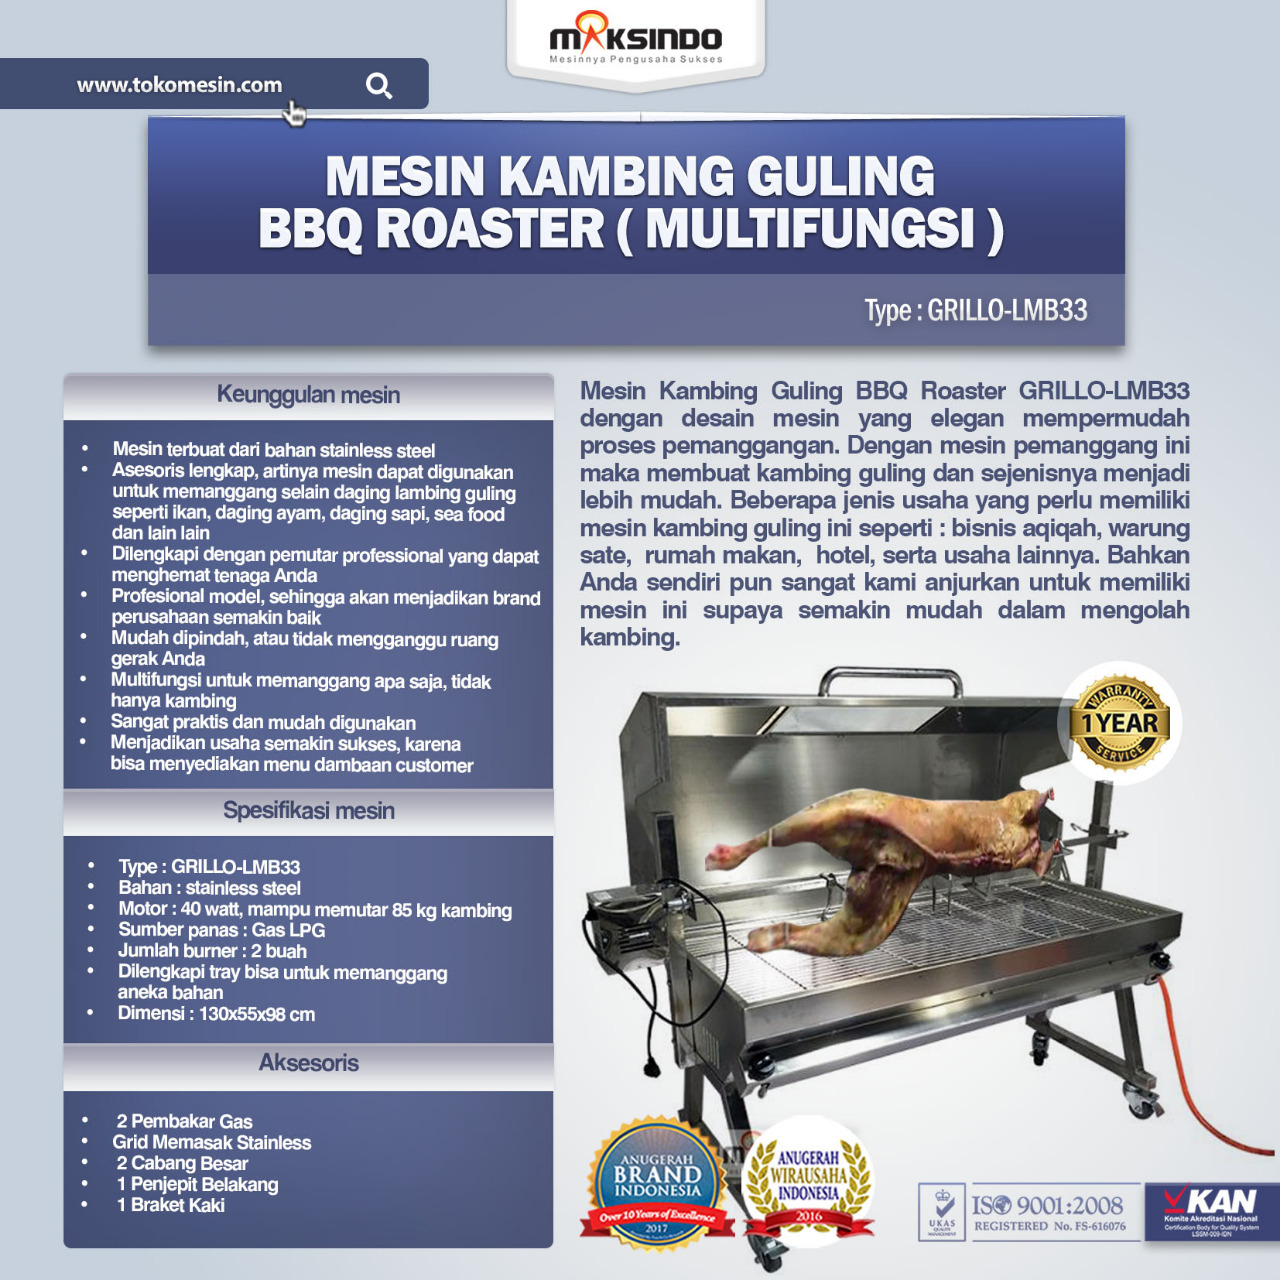 Jual Mesin Kambing Guling Gas Grillo Lmb33 Di Bandung Toko Mesin Maksindo Bandung Toko Mesin Maksindo Bandung